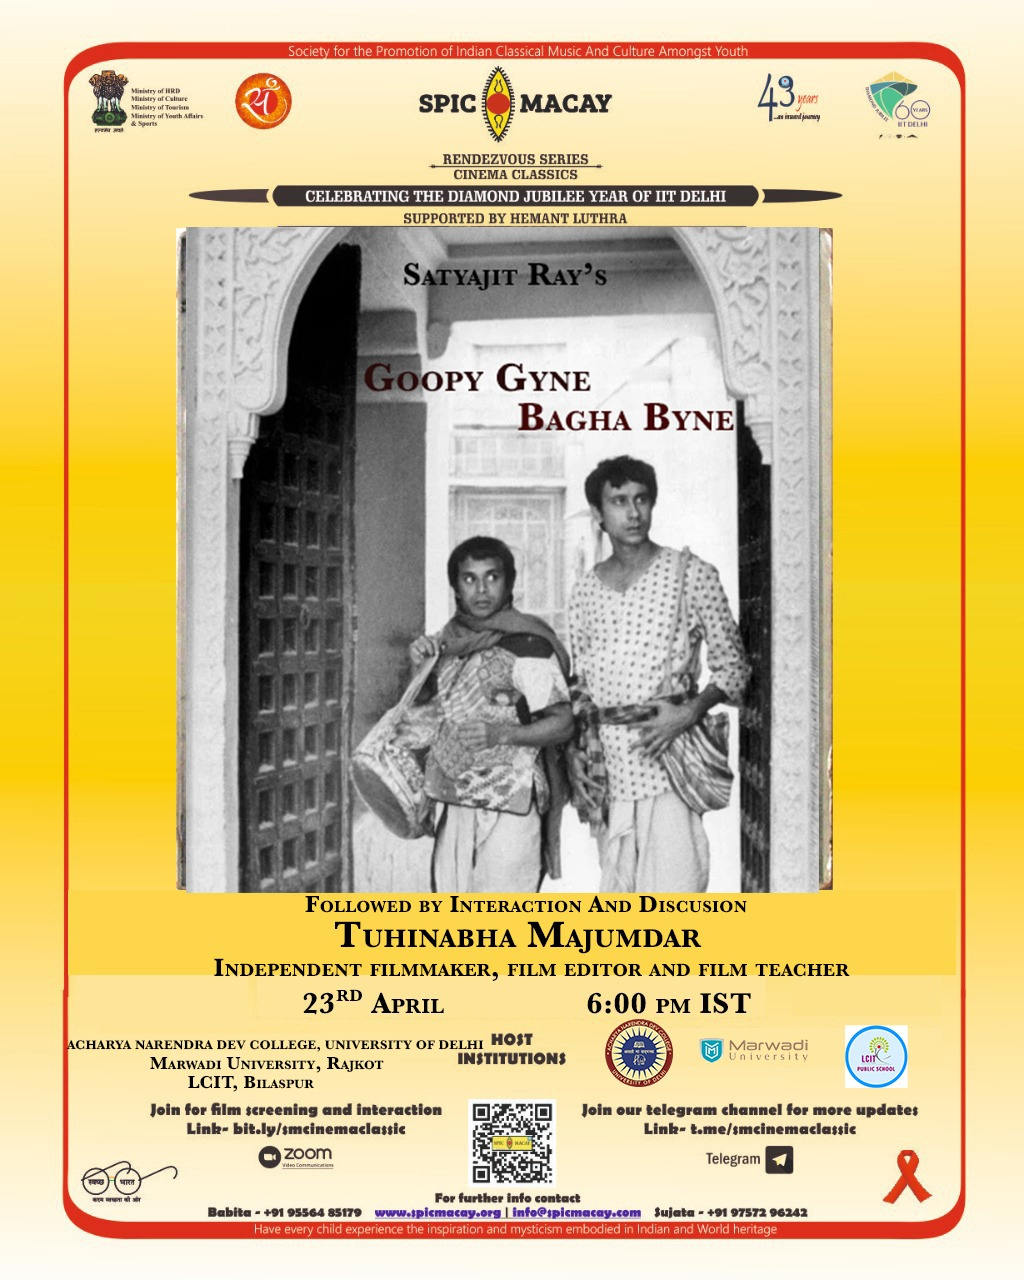 SPIC MACAY Cinema Classics presents Goopy Gayen Bagha Bayen (1968) film by Satyajit Ray   [Bengali (English subtitles)]  (Duration: 113 min)